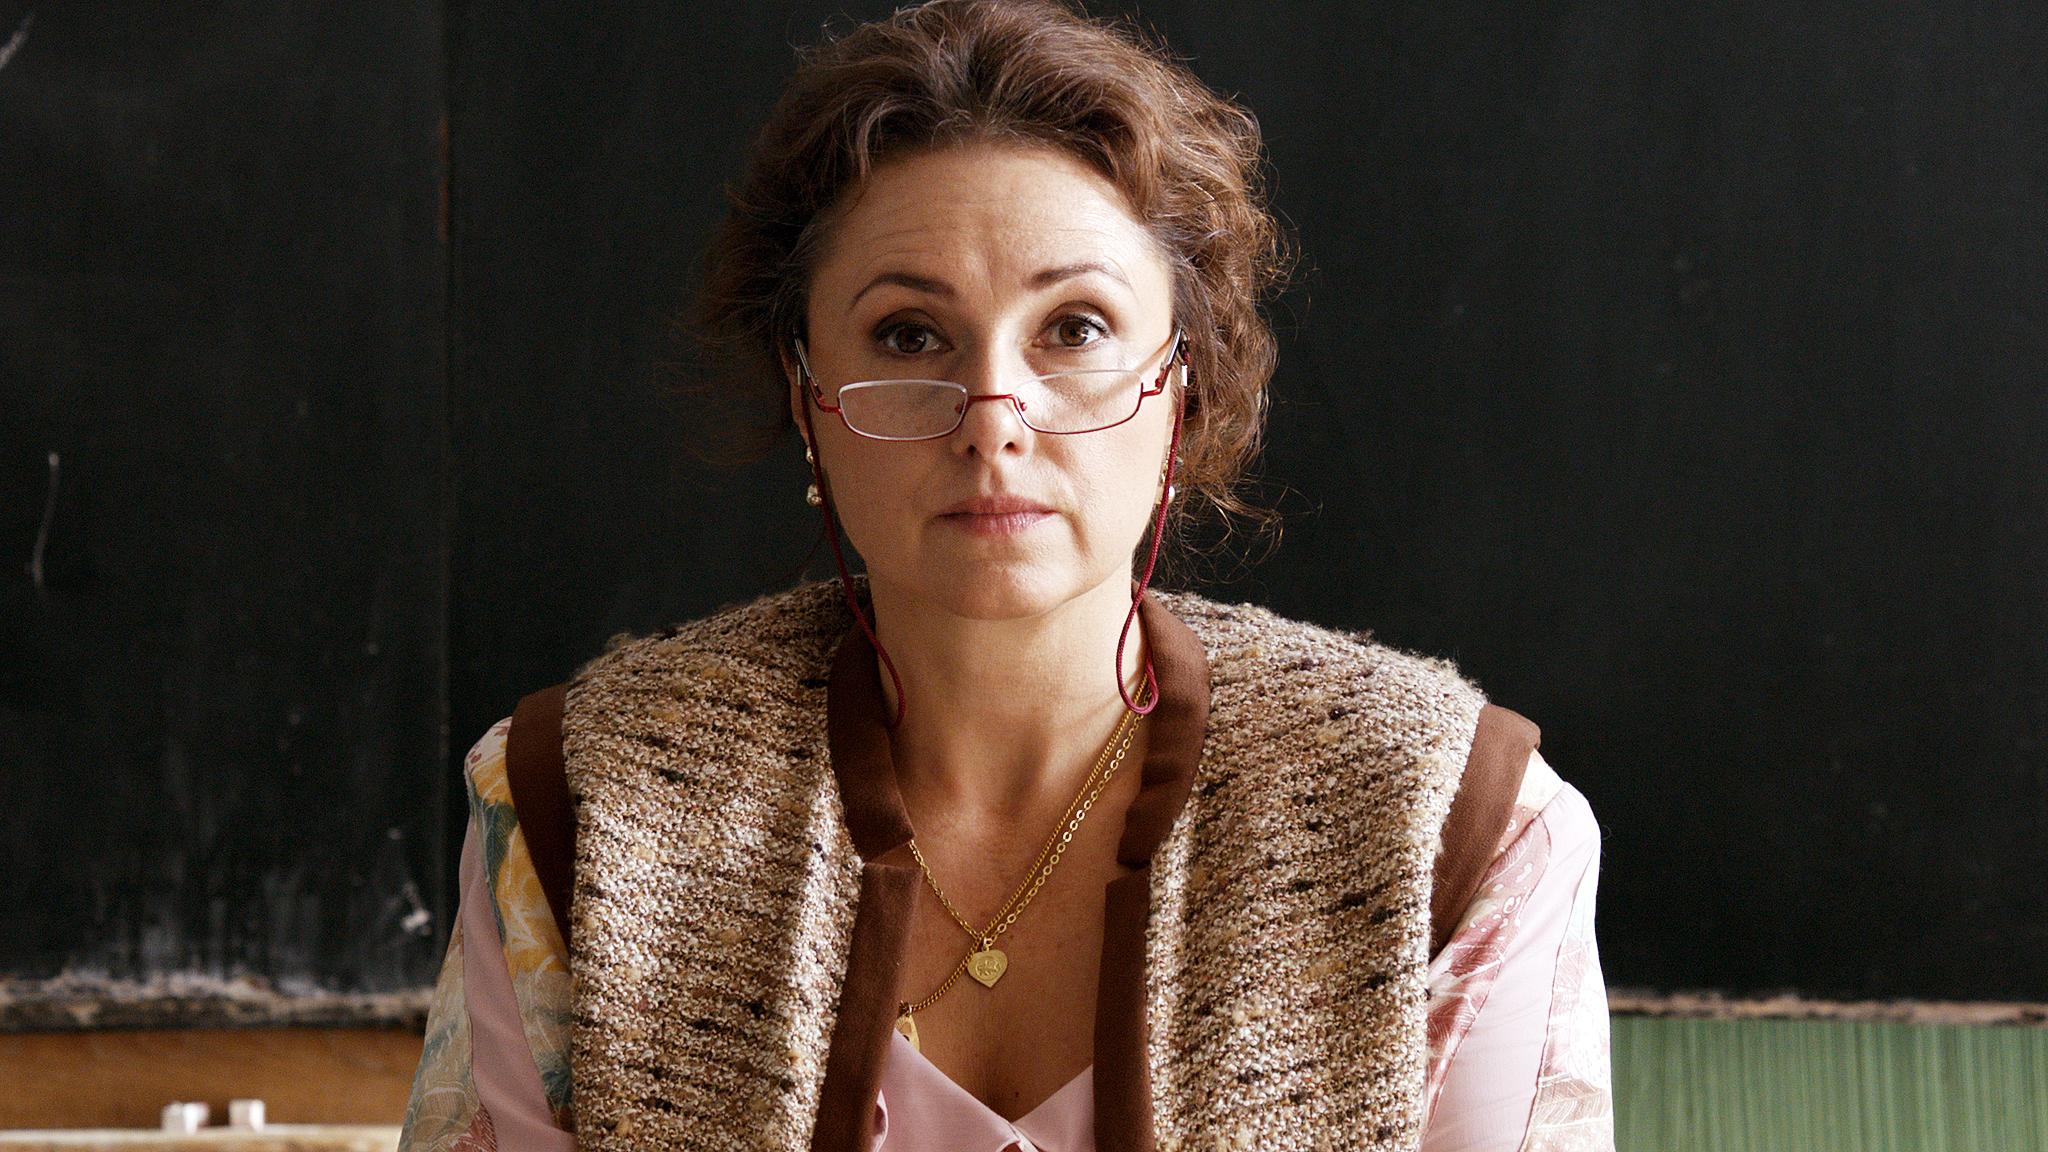 The KVIFF 2016 Best Actress  Zuzana Maurery  from Slovakia (Mrs. Drazdechova, The Teacher). Photo by PubRes, 2015.